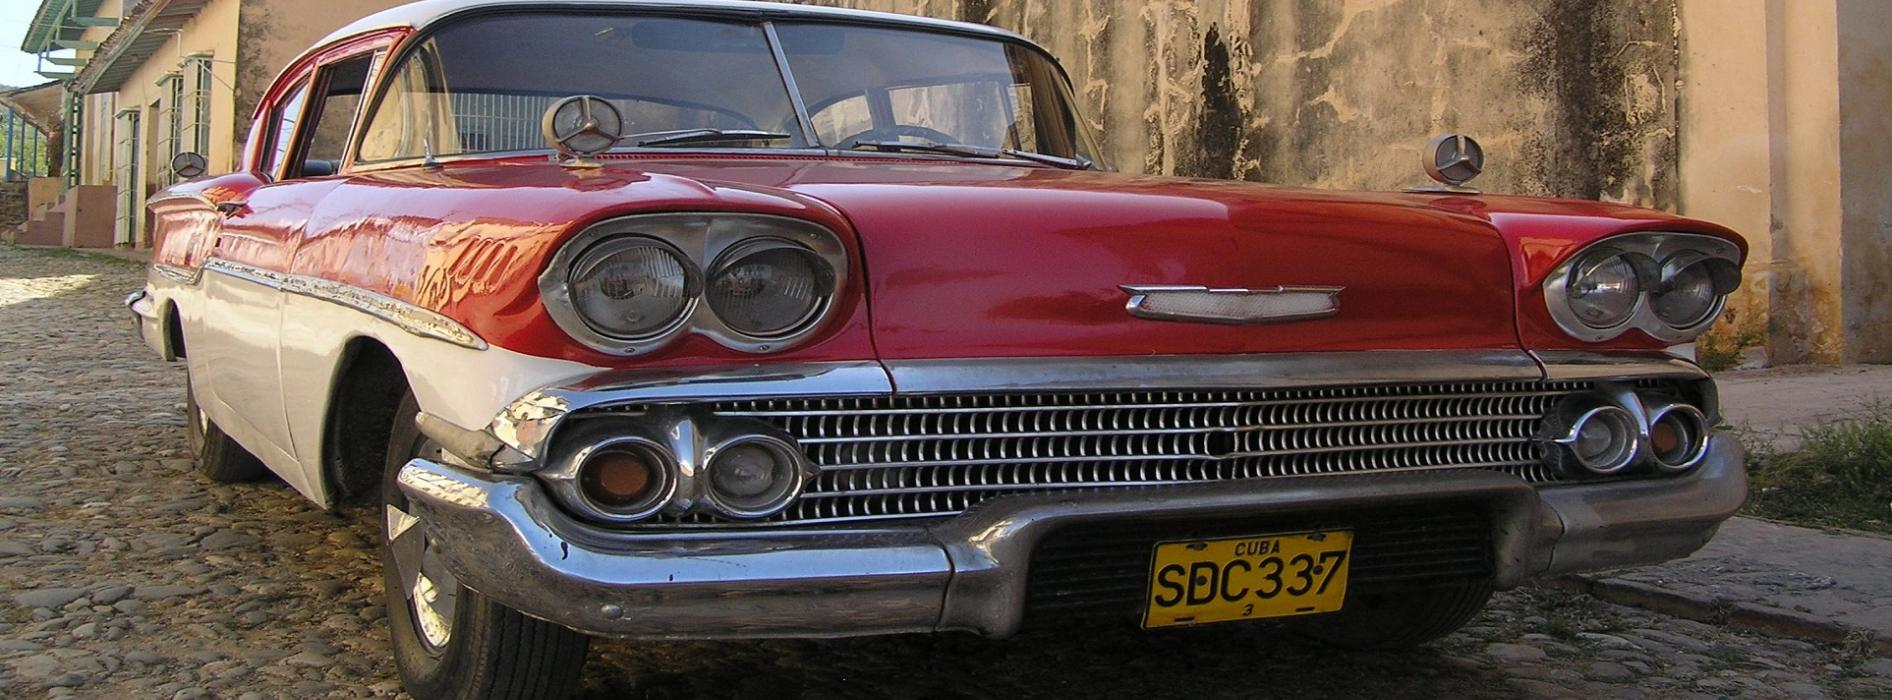 Cadillac, Trinidad Cuba.jpg